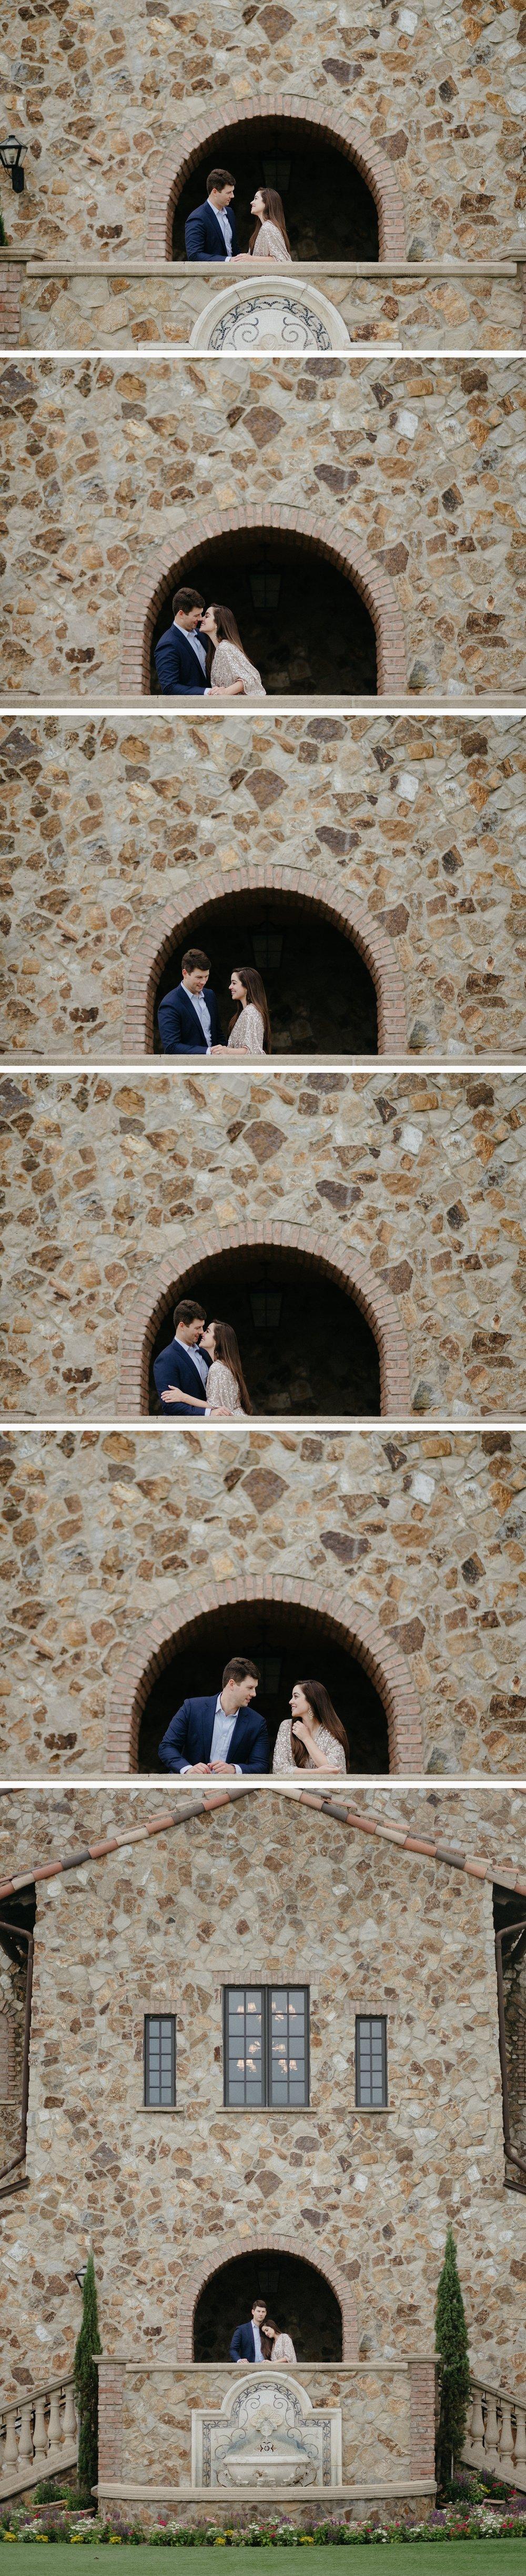 Megan-And-Jeremy-Bella-Collina-Engagement_0024.jpg